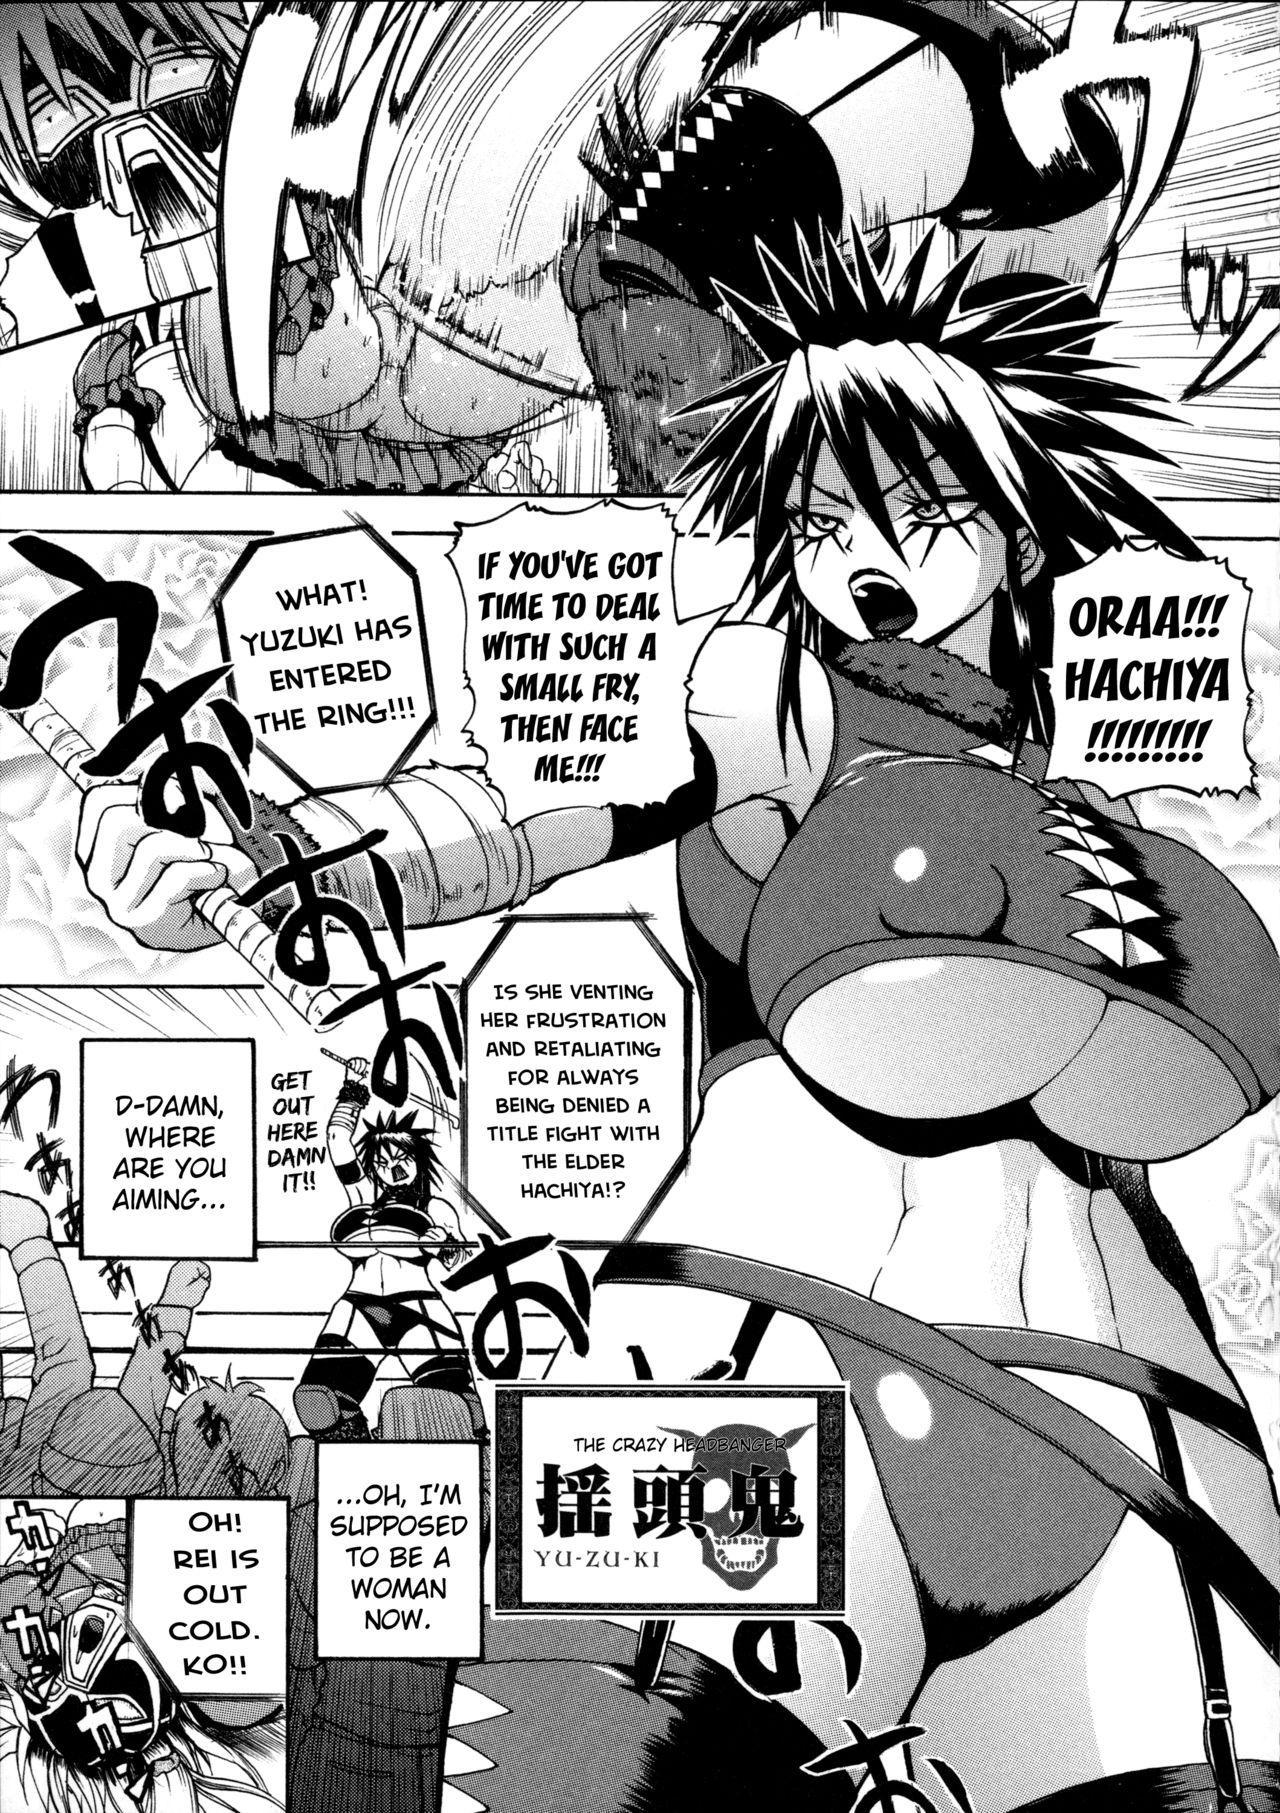 [Yoshimura Tatsumaki] Monzetsu Taigatame ~Count 3 de Ikasete Ageru~ | Faint in Agony Bodylock ~I'll make you cum on the count of 3~ [English] [Brolen] 25